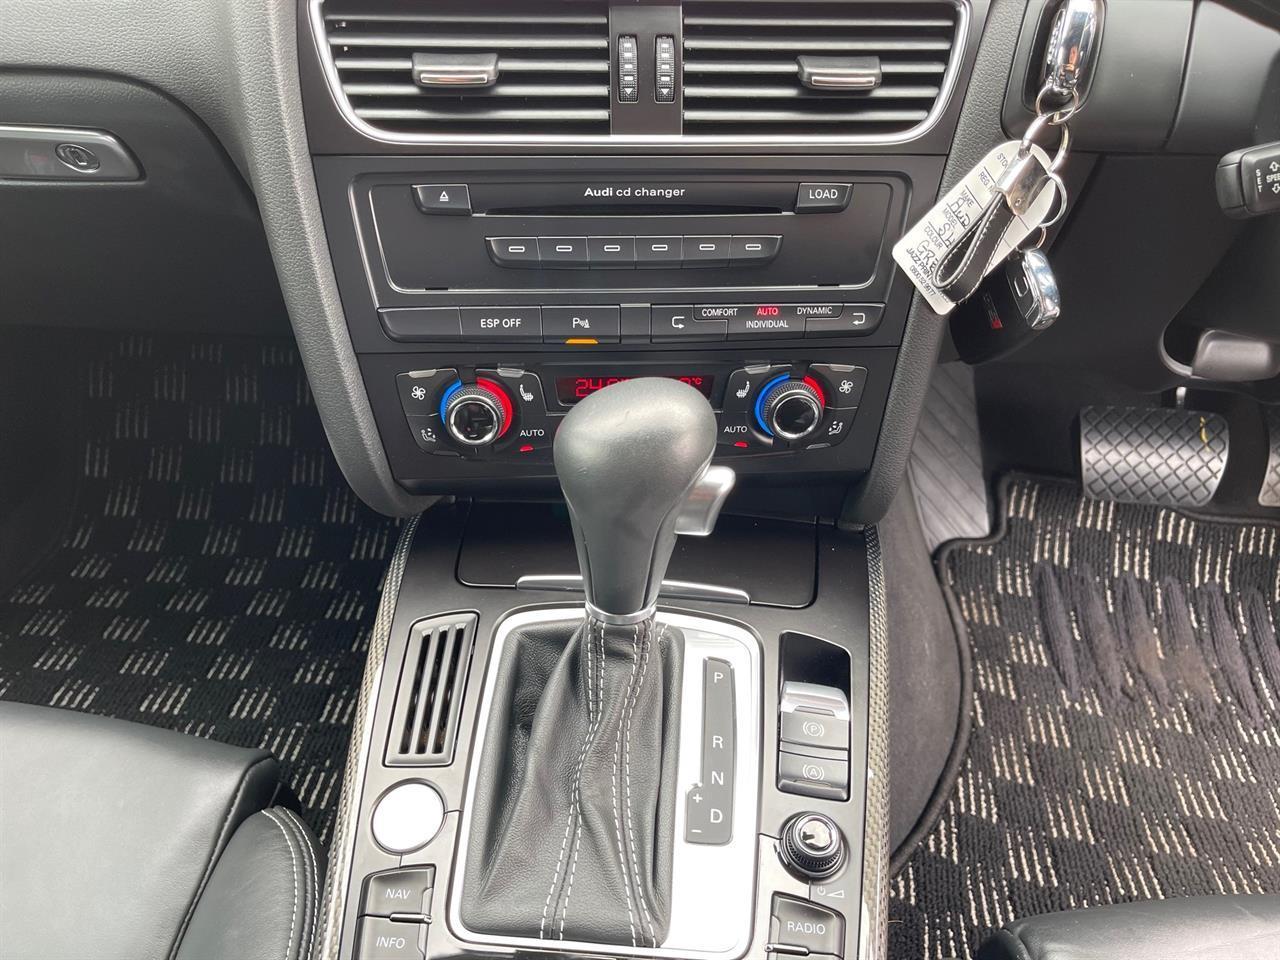 image-13, 2009 Audi S4 3.0 V6 Supercharged TFSI Quattro Wago at Christchurch